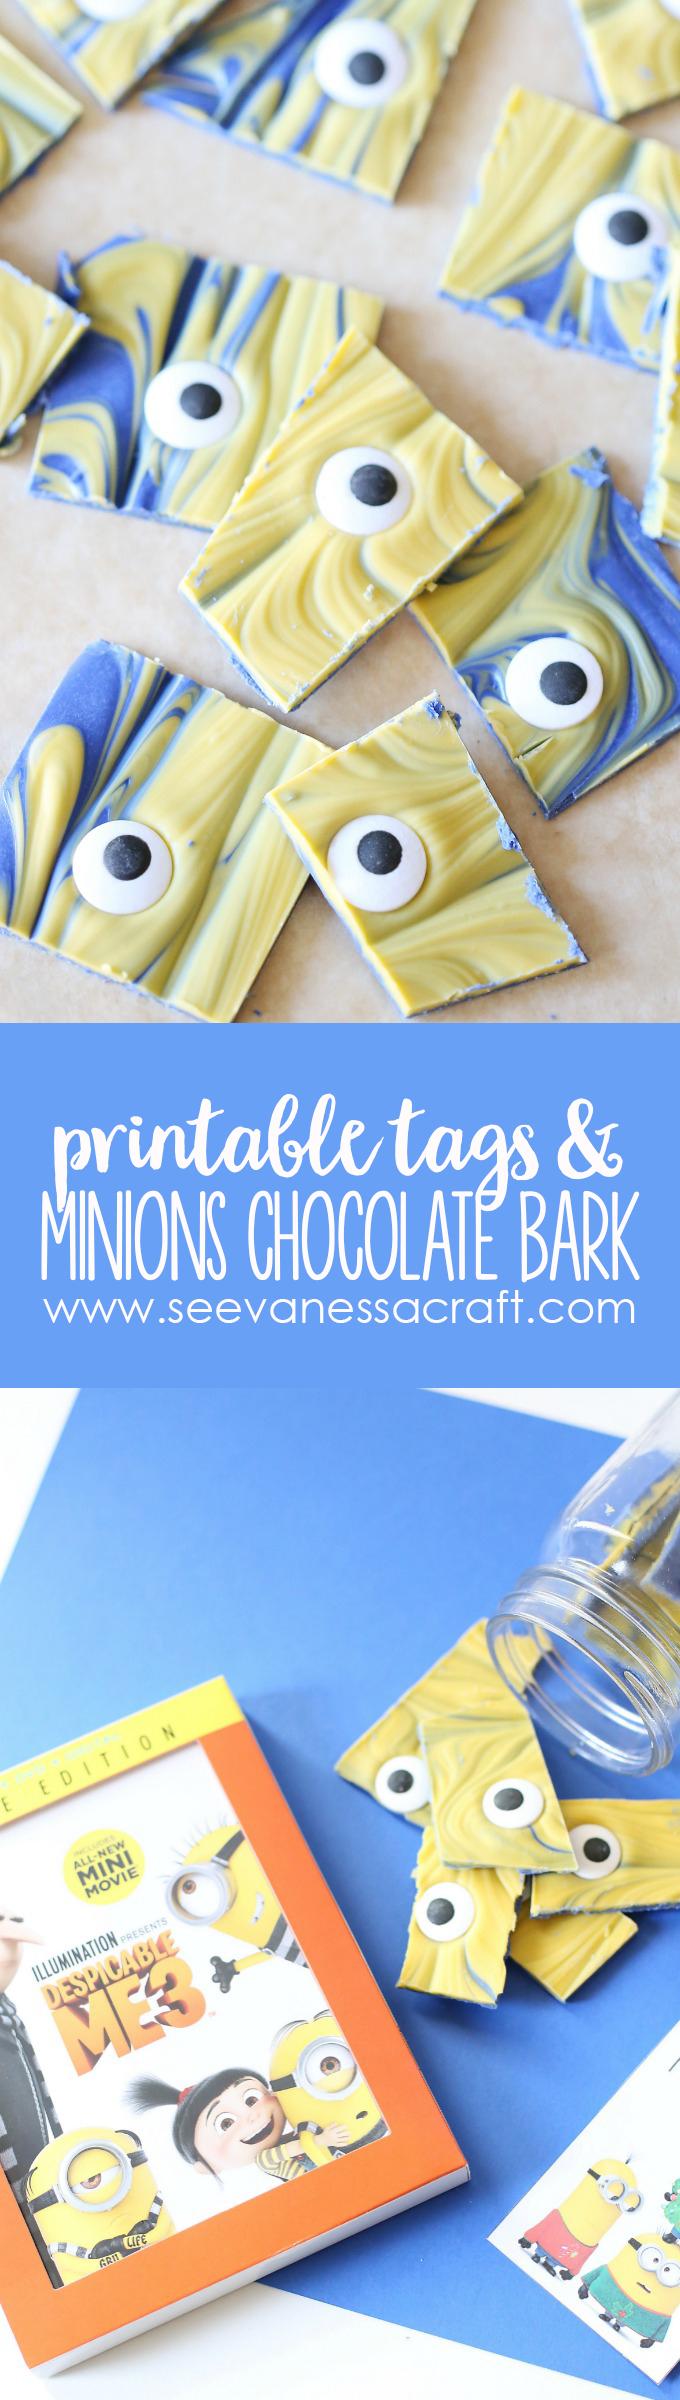 Minions Chocolate Bark Recipe and Printable Gift Tags